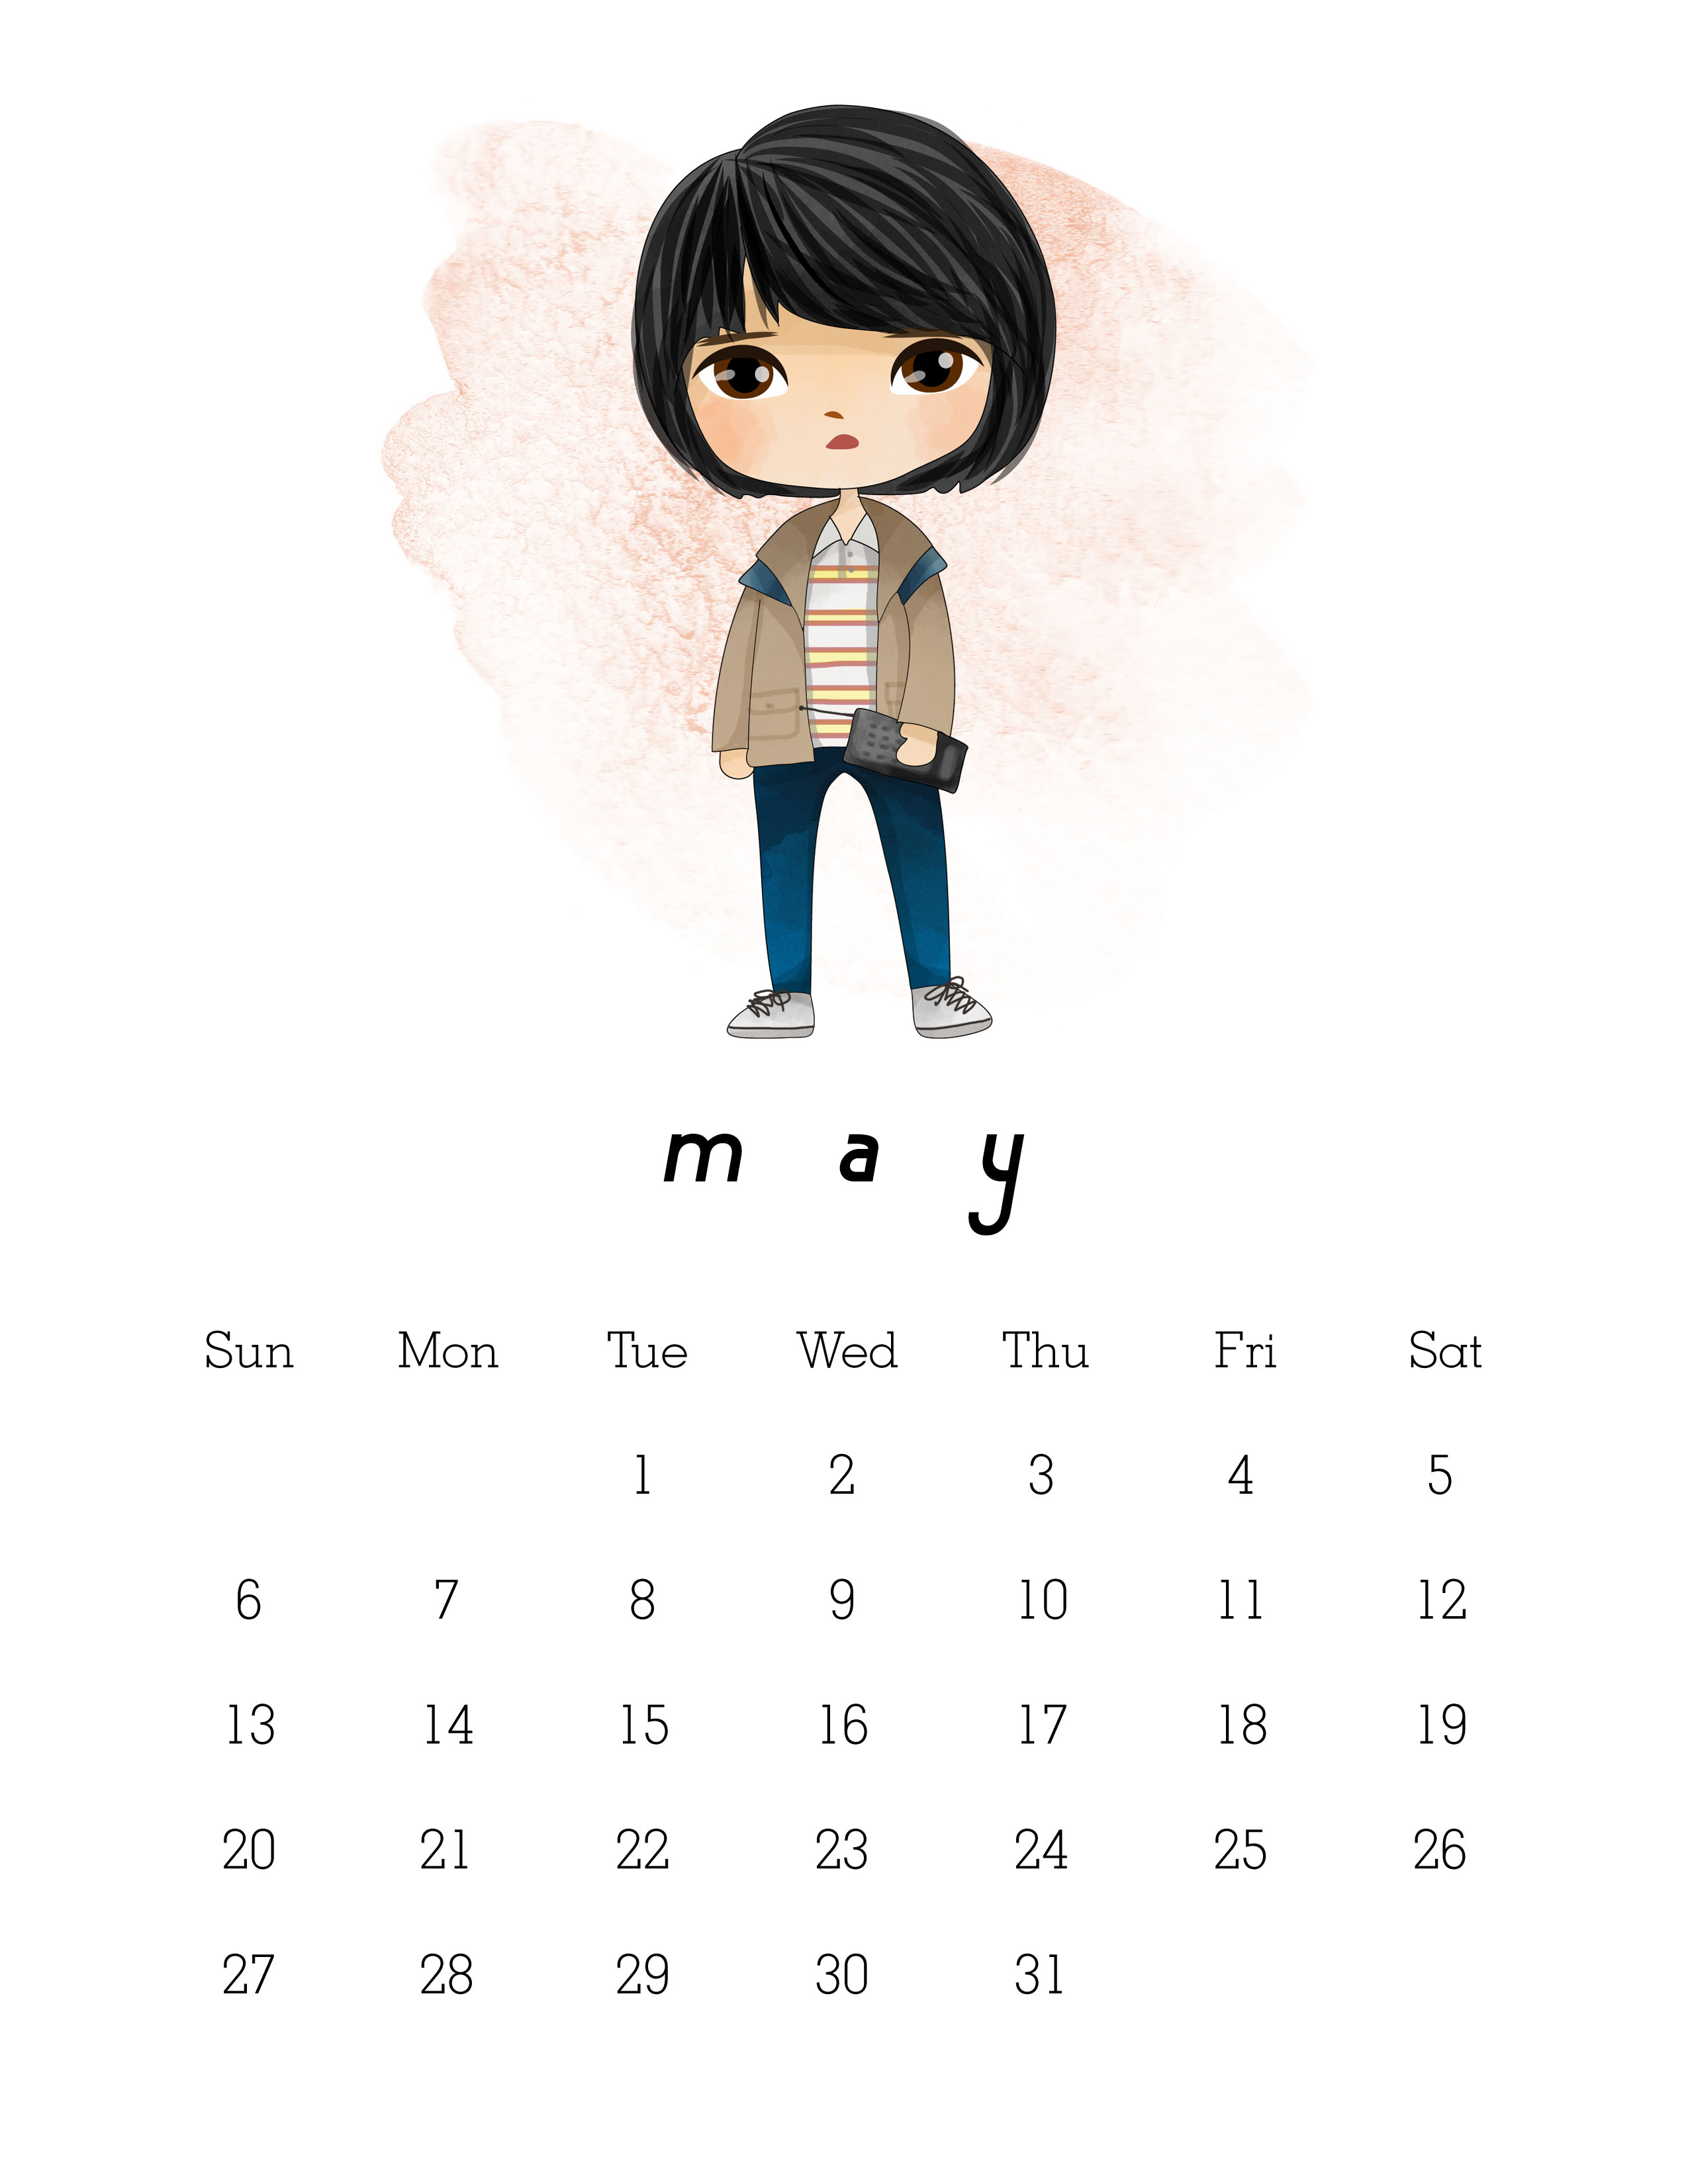 Calendario Stranger Things.Free Printable 2018 Stranger Things Calendar The Cottage